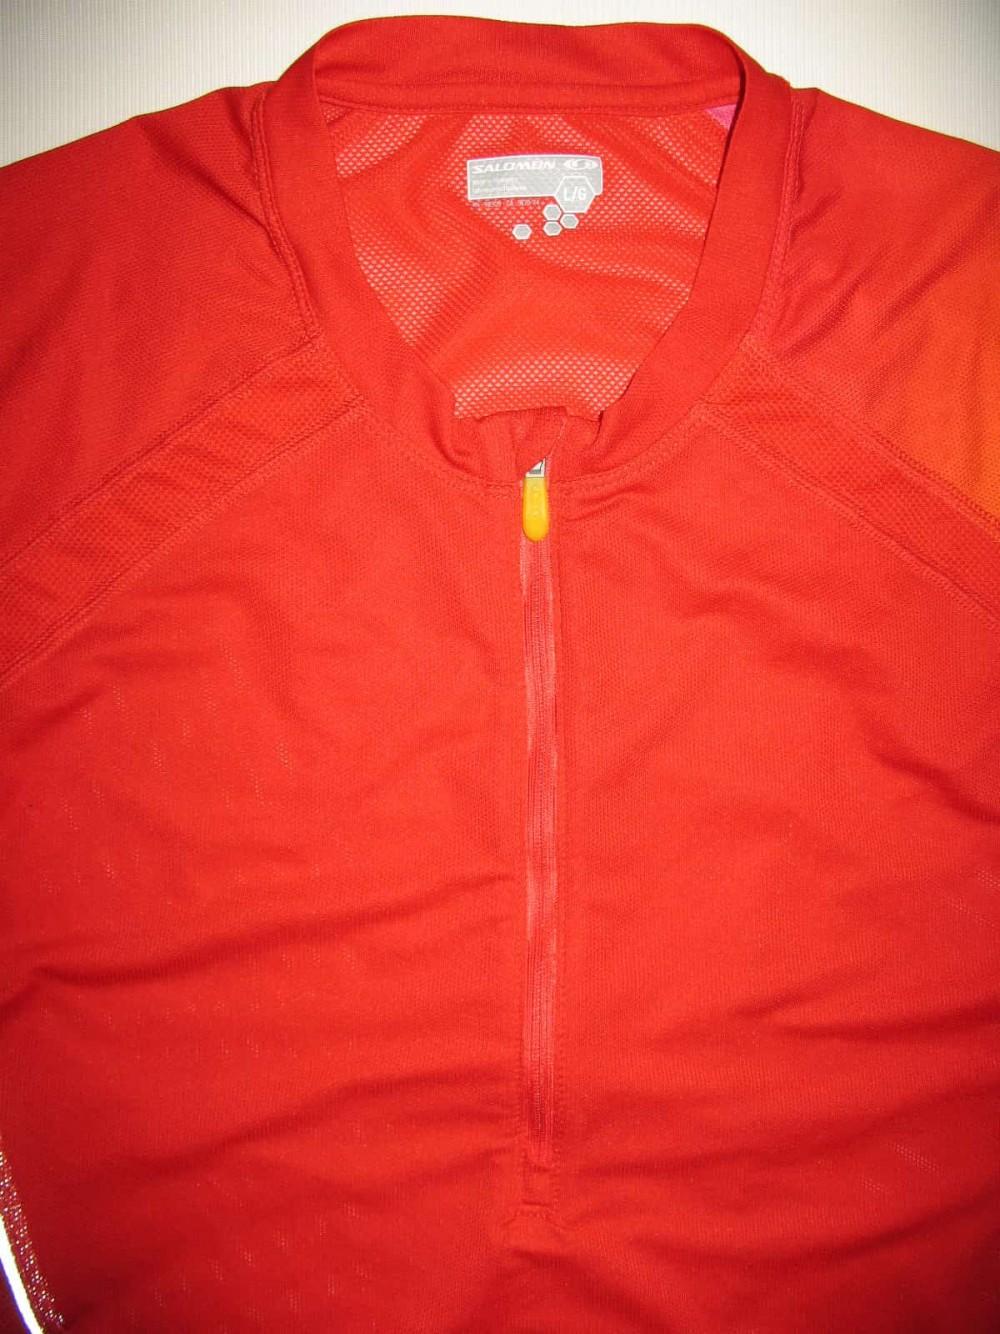 Футболка SALOMON actilite trail run jersey (размер L) - 3